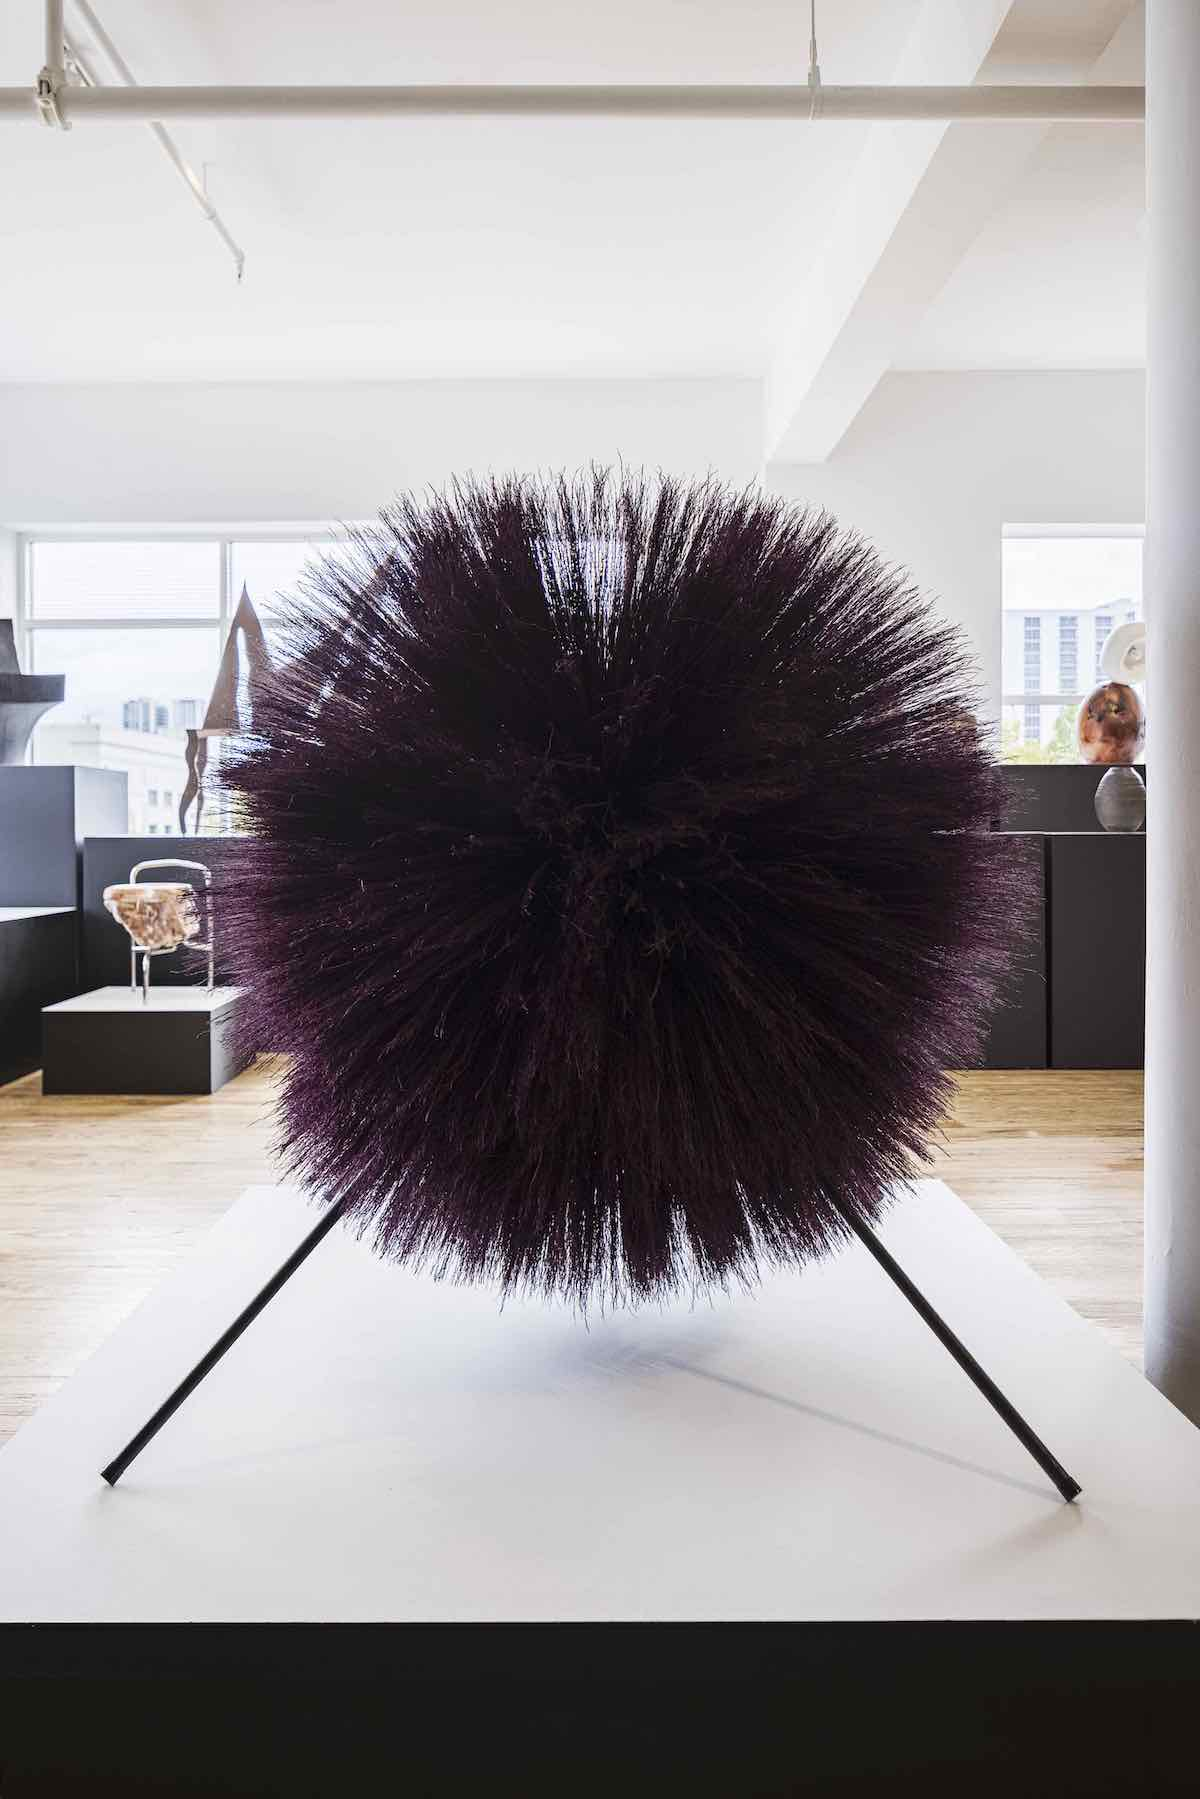 DesignMiami 2020 - Broom Thing by Stephen Burks - Photo by Kris Tamburello.